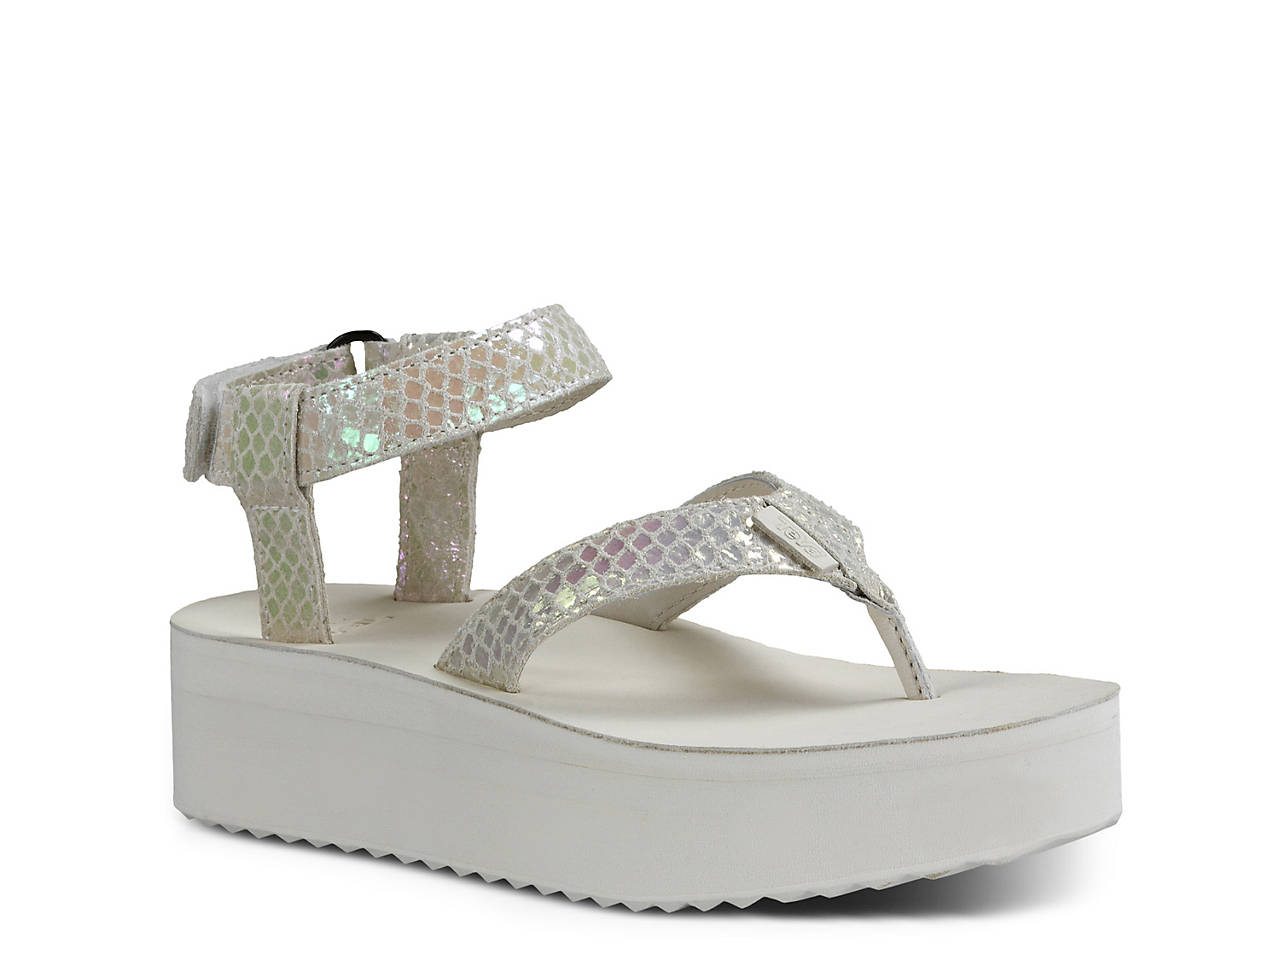 c445d7e3a94e Teva Flatform Universal Iridescent Sandal Women s Shoes